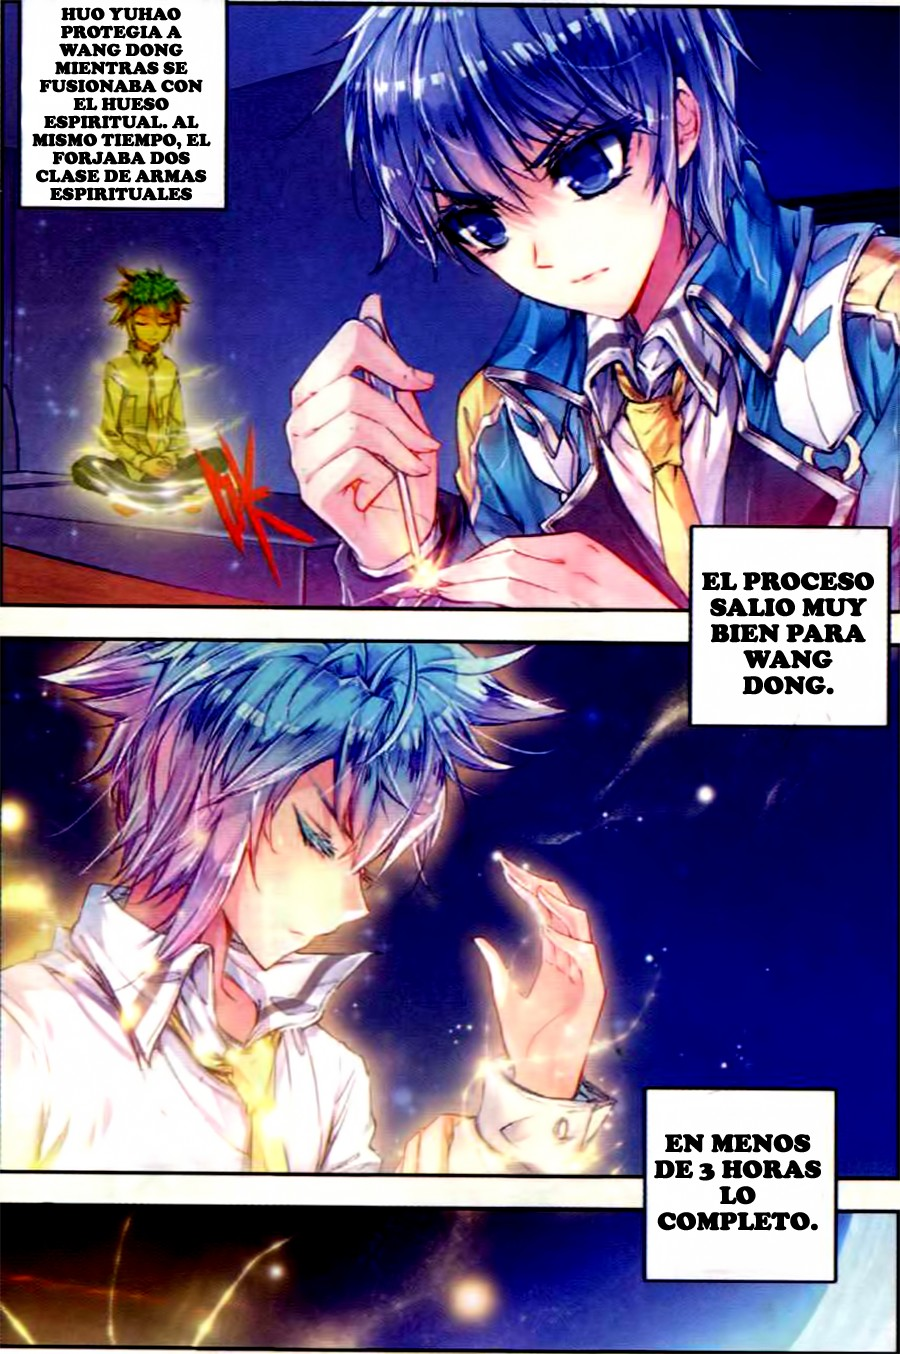 http://c5.ninemanga.com/es_manga/33/16417/435101/5e292e6b36e99623f2fba7aff1f19bf9.jpg Page 8